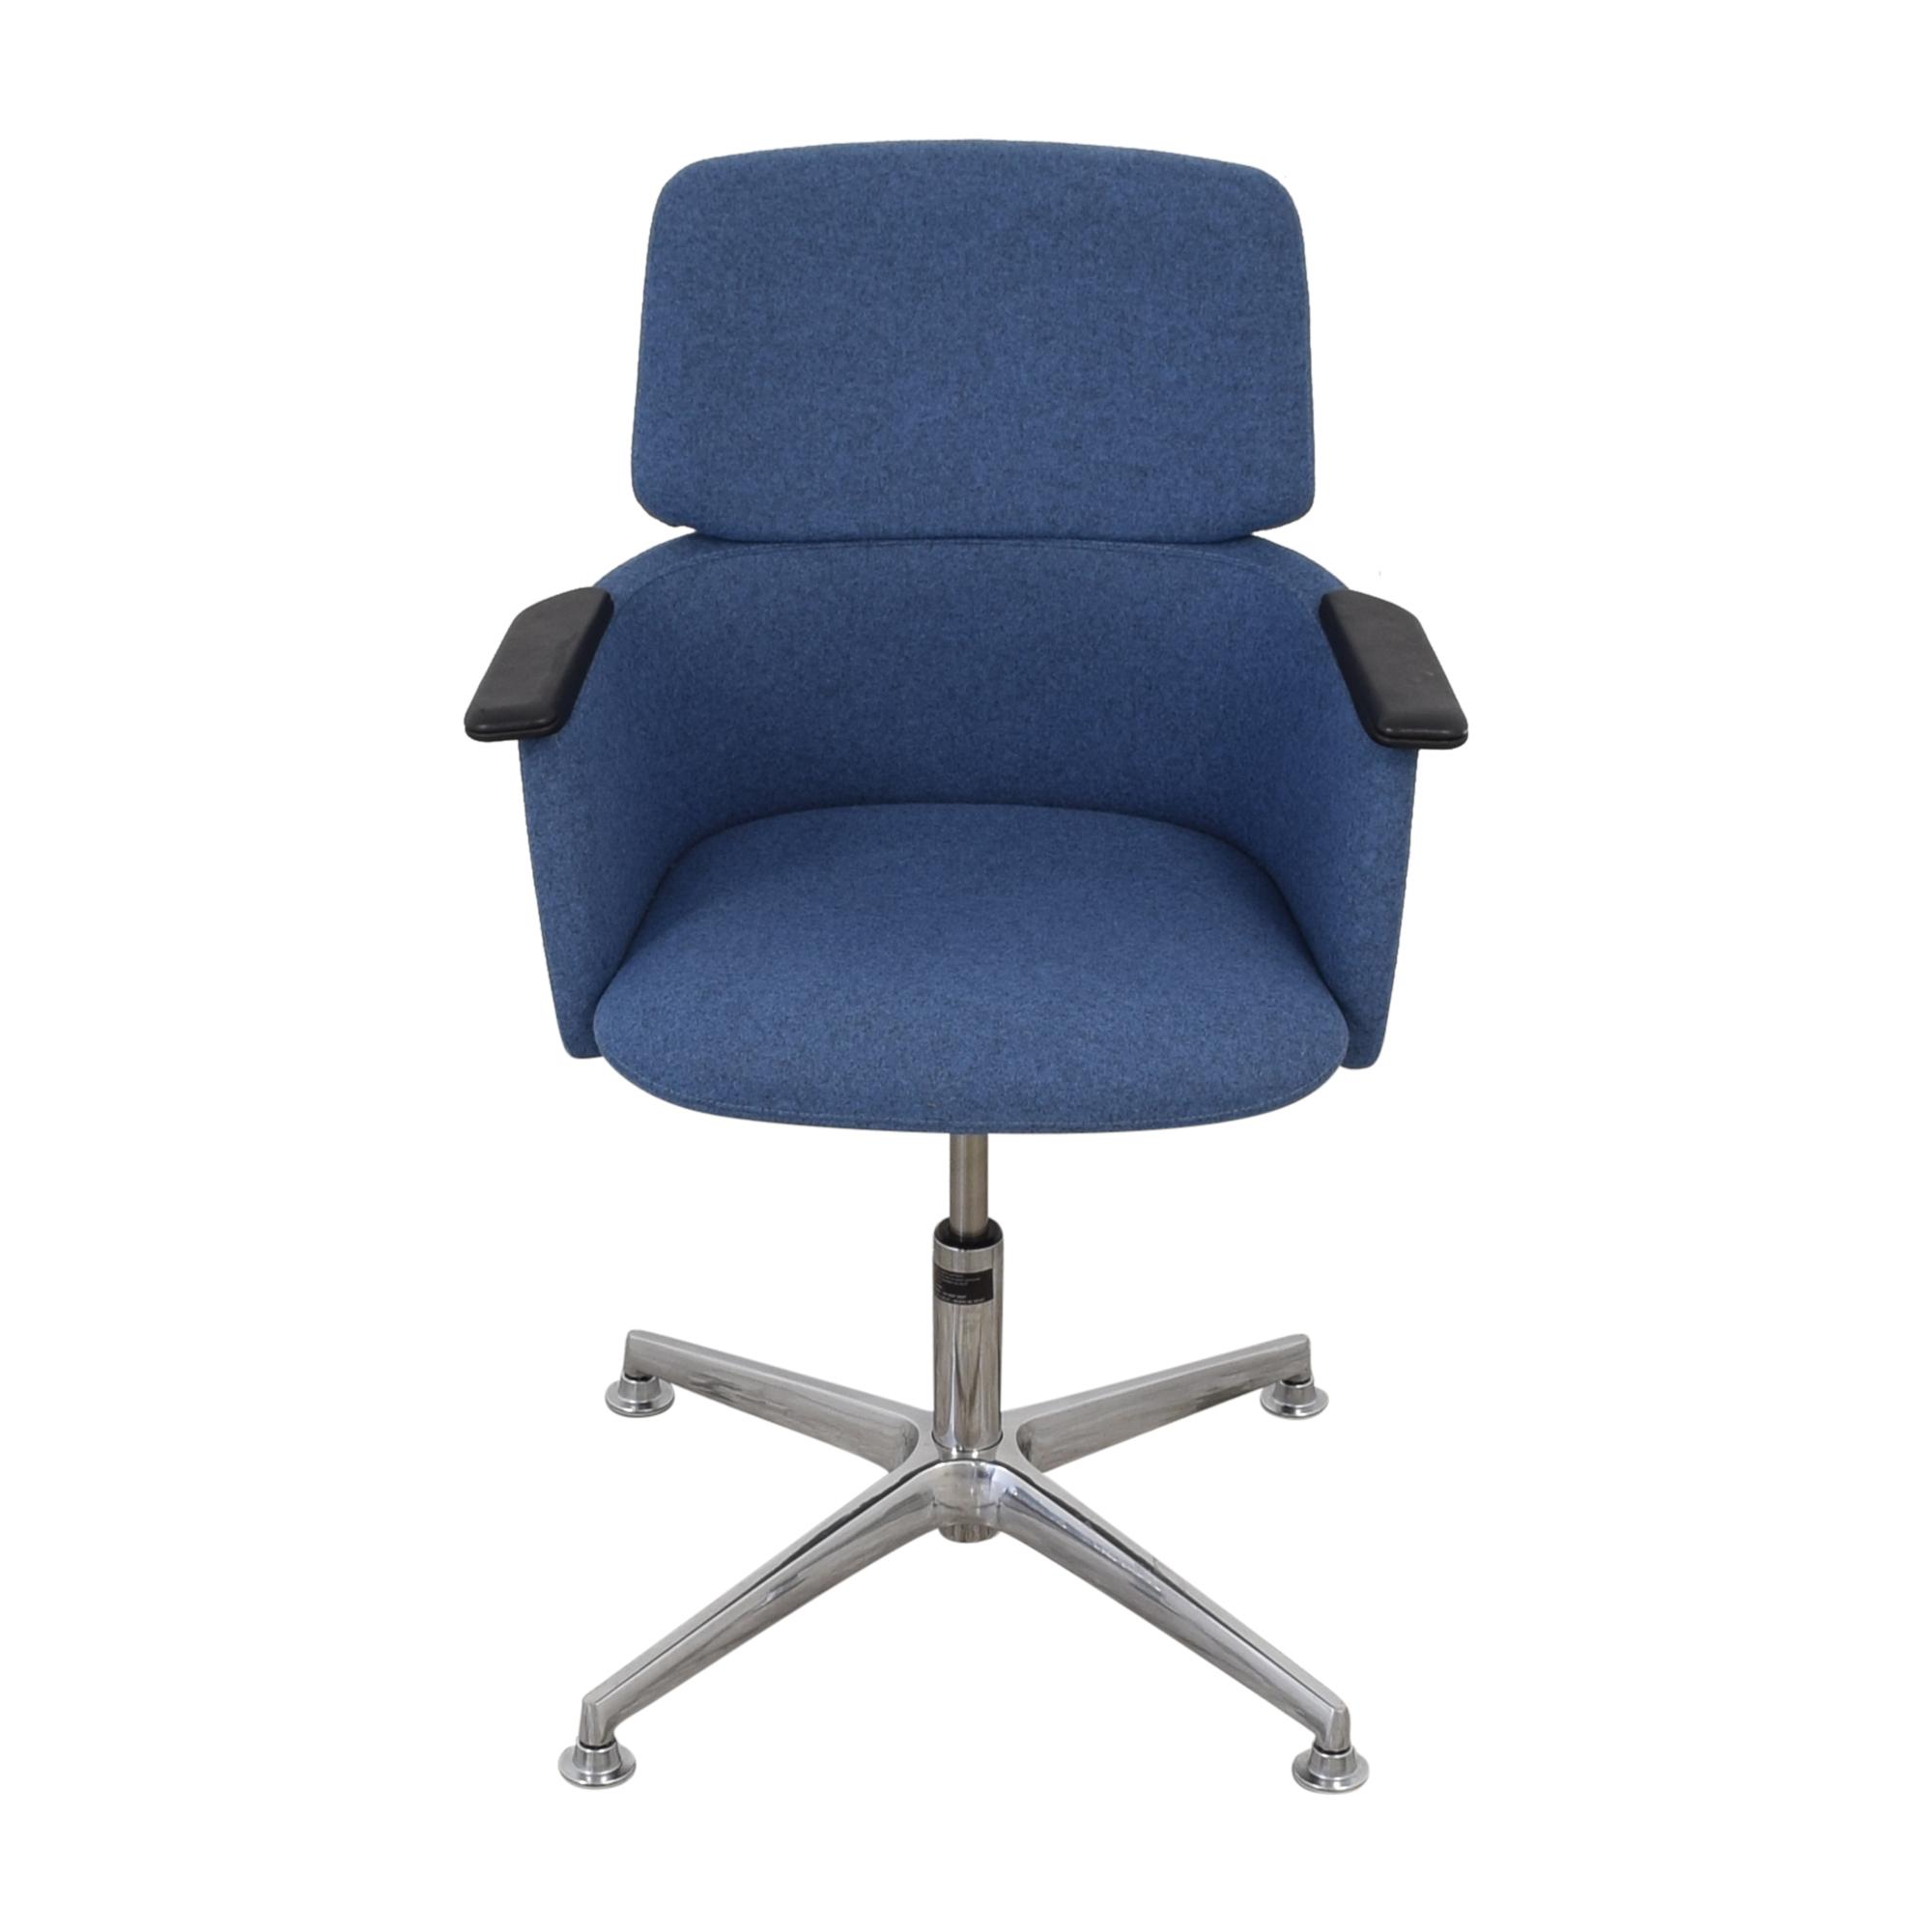 shop Koleksiyon Tola Visitor Chair Koleksiyon Home Office Chairs